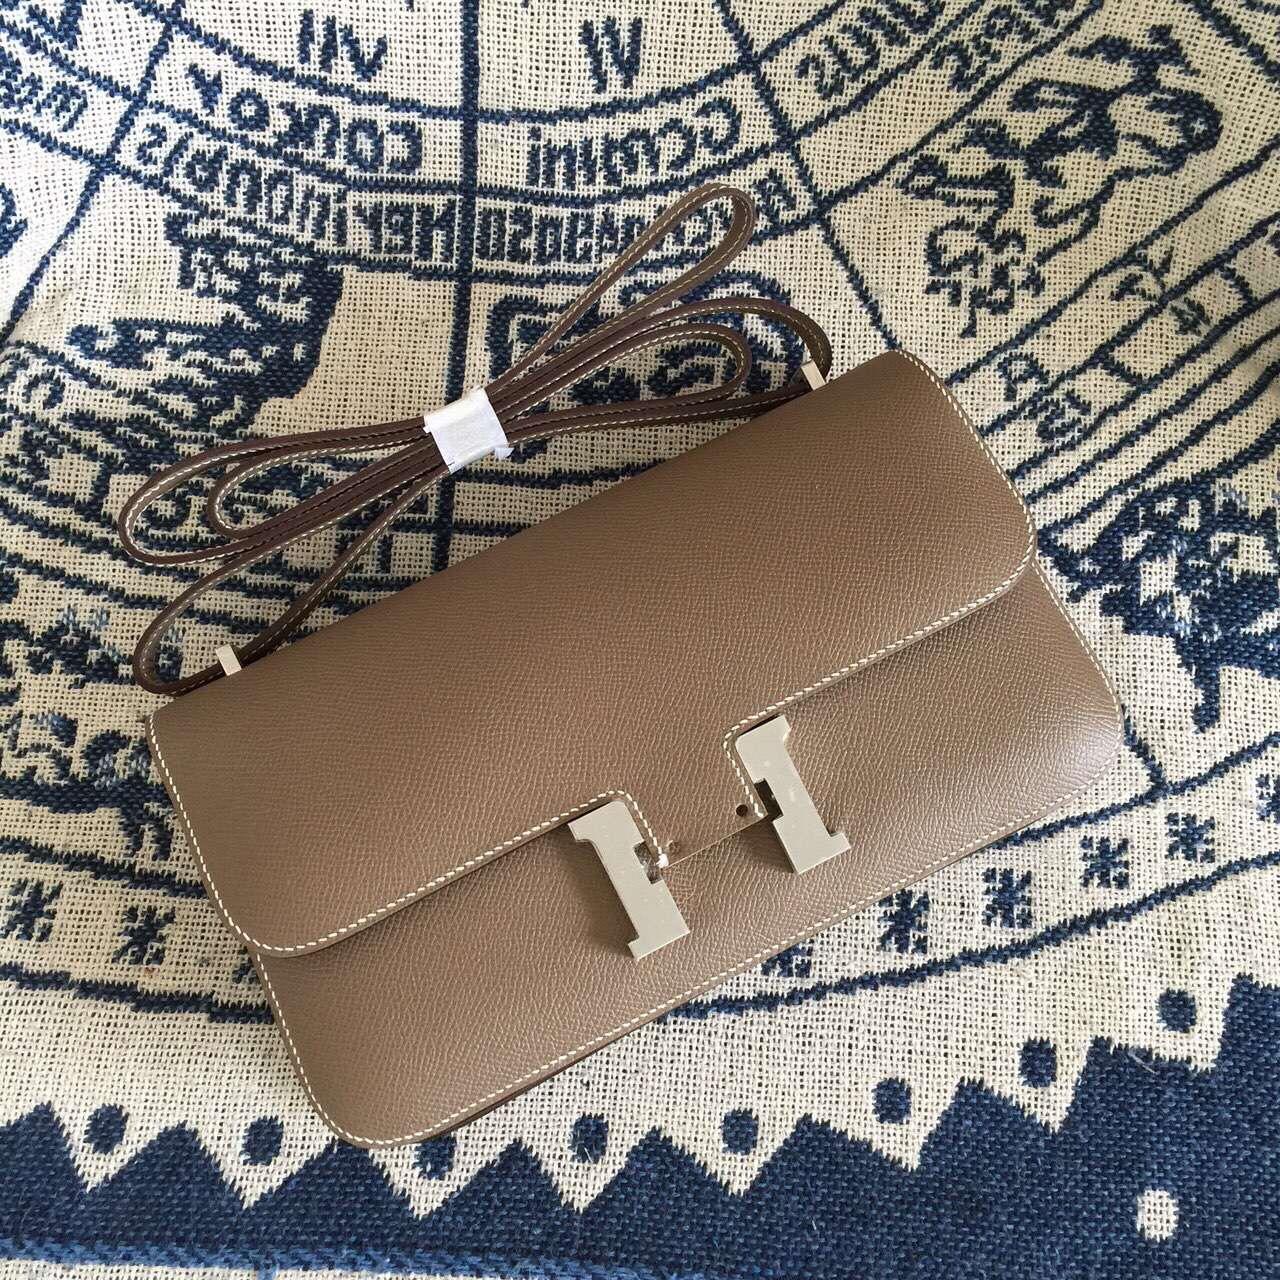 Wholesale Hermes Handbag Epsom Calfskin CK18 Etoupe Grey Constance Bag26